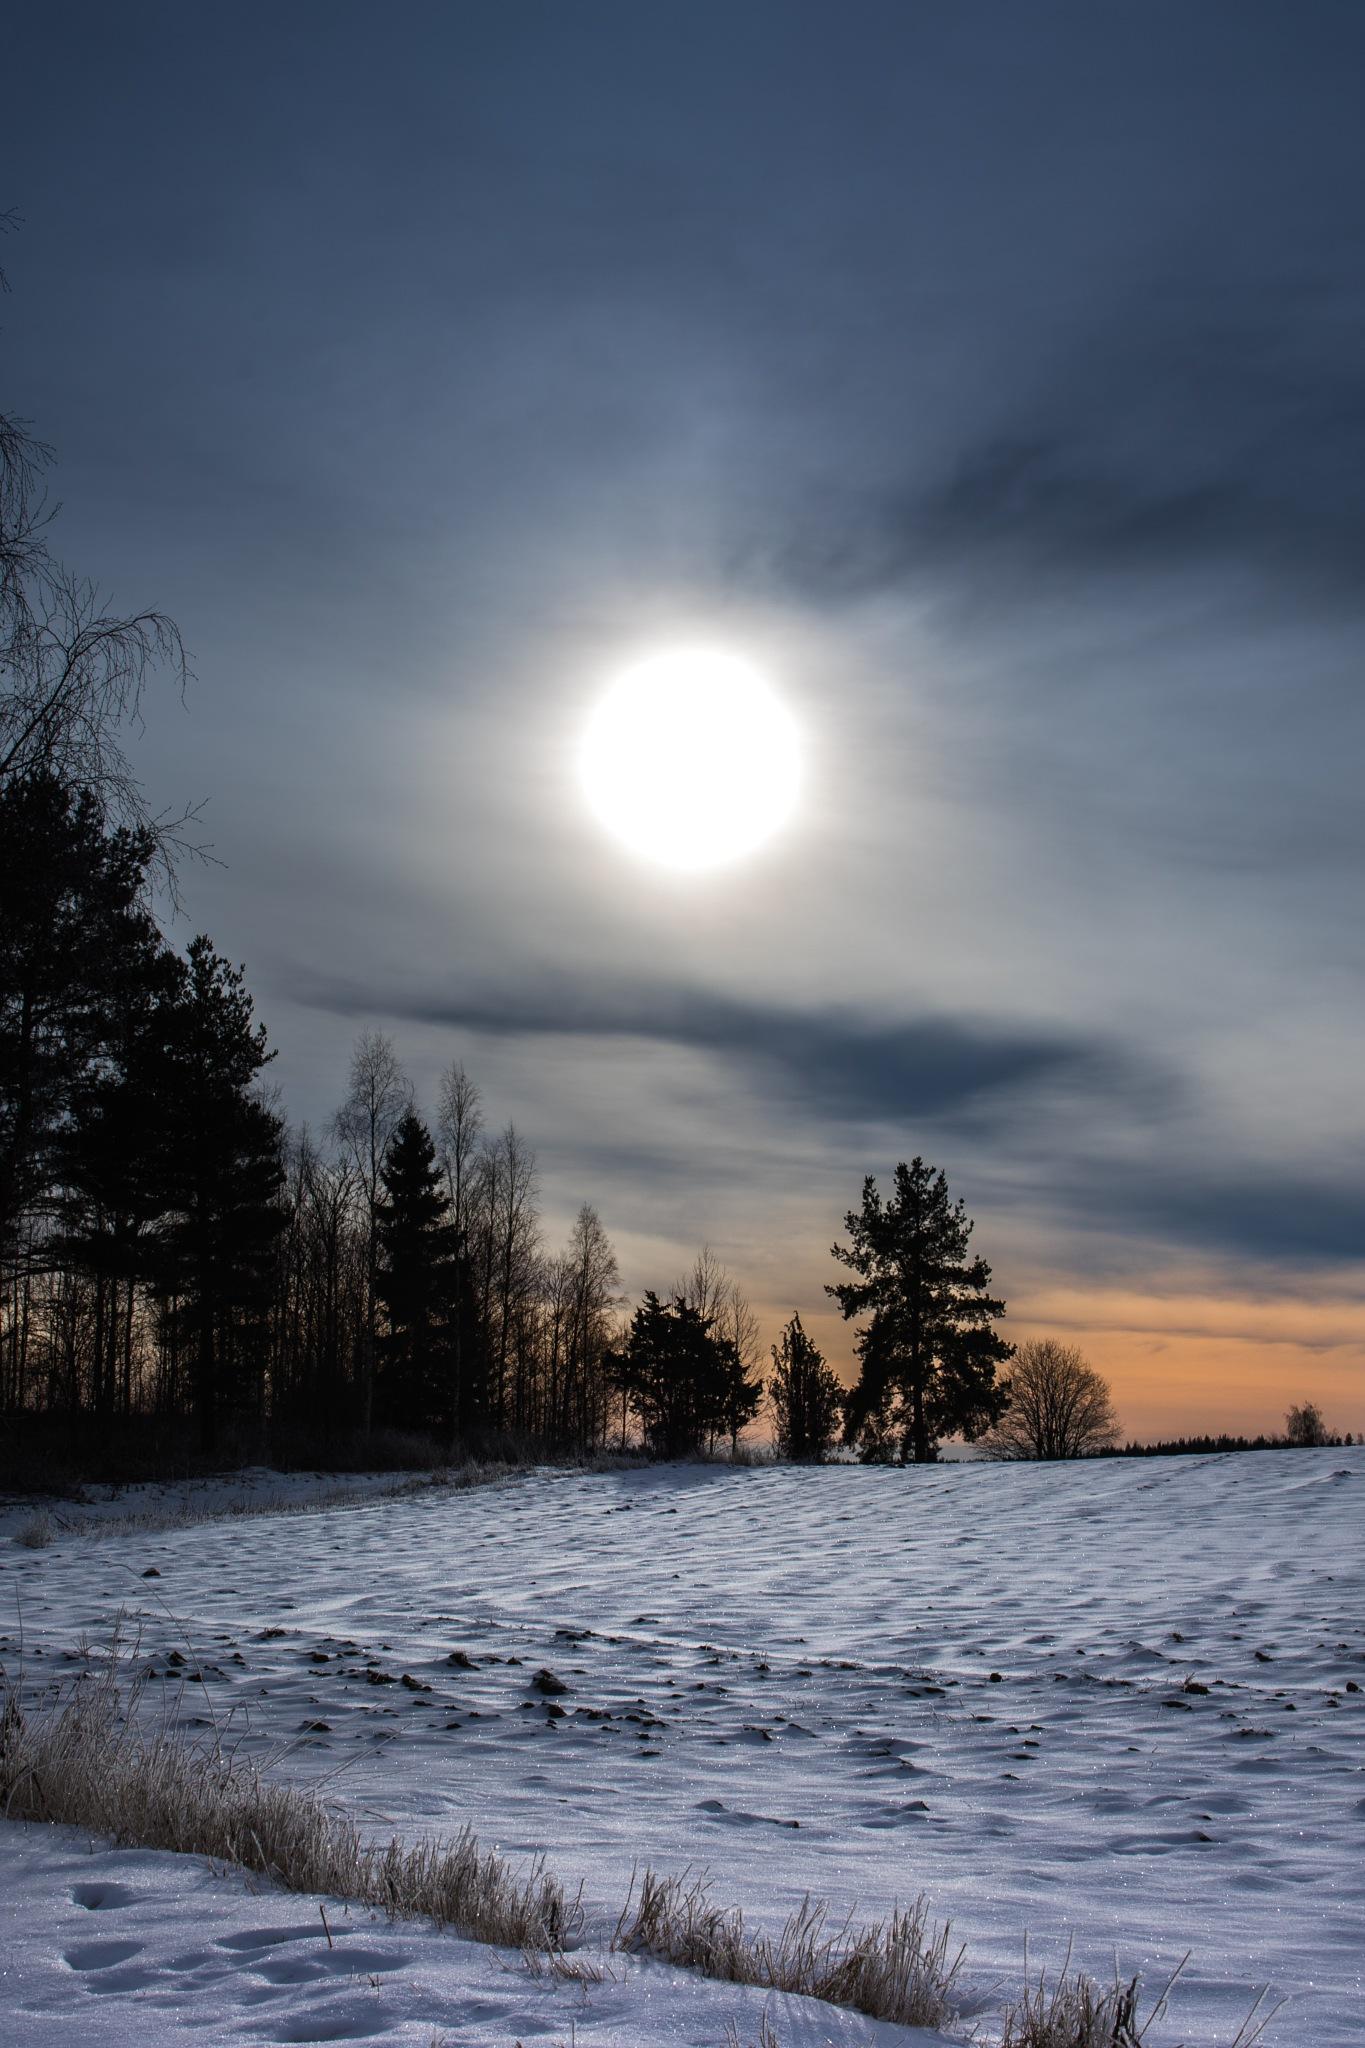 Enchanted afternoon by Linda Myrberg